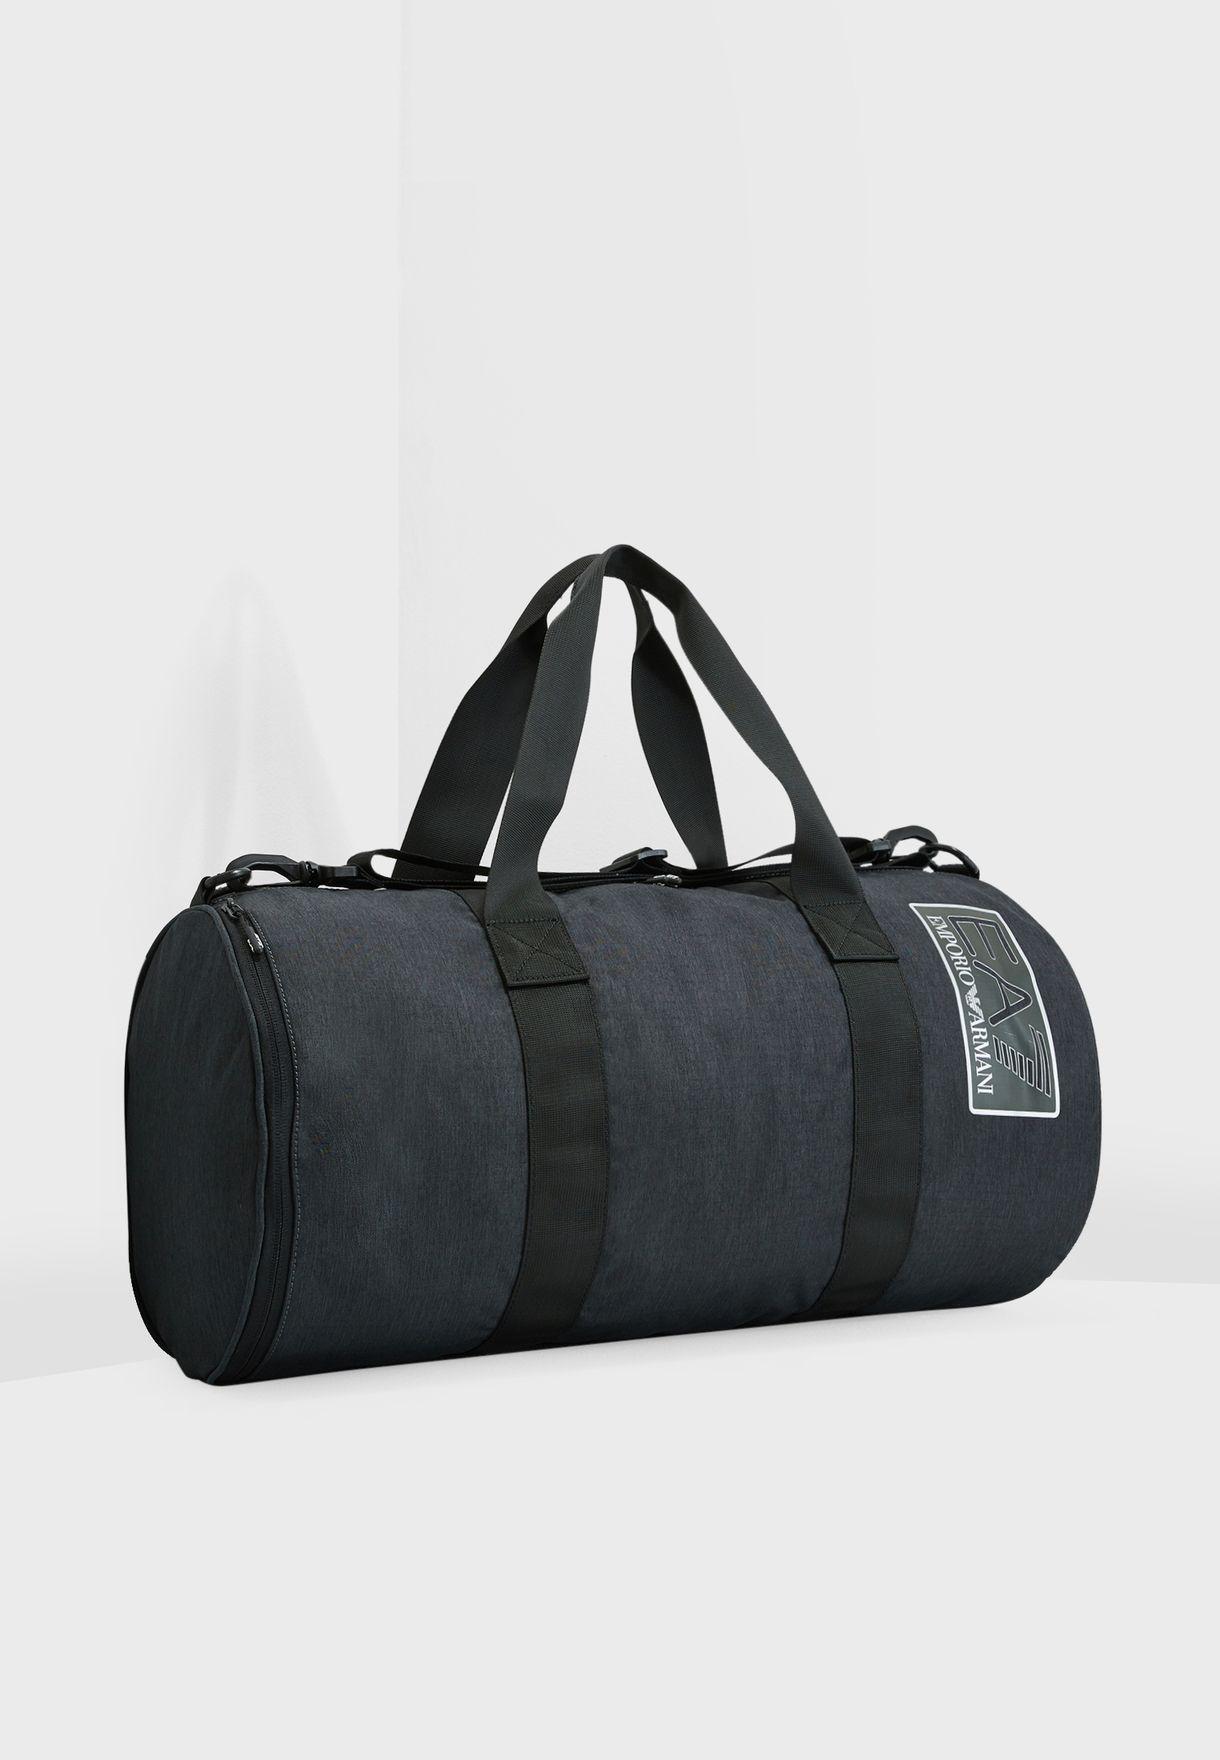 301d842e4e Shop Ea7 Emporio Armani black Train Duffle Bag 8A803-275823-27020 ...